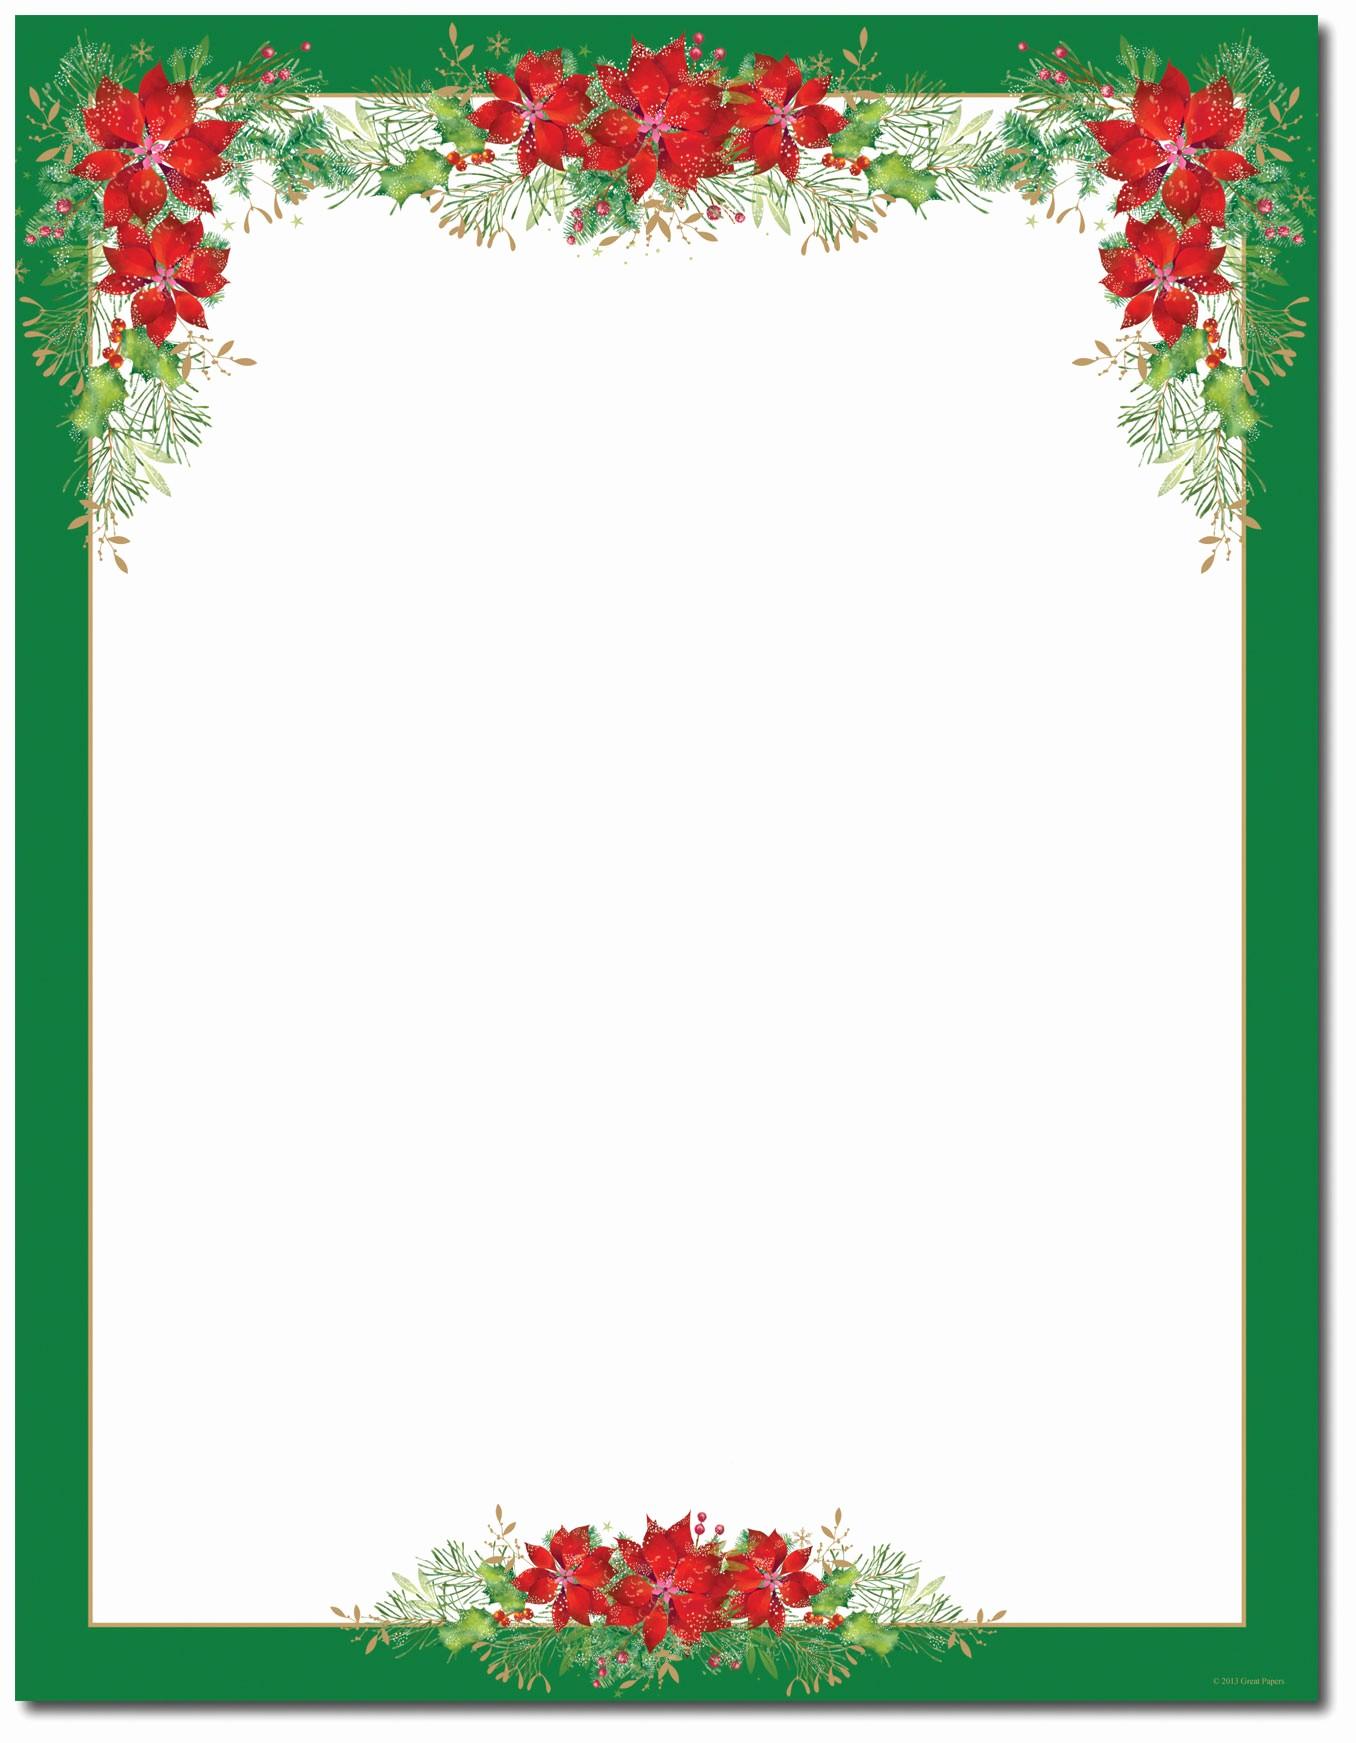 Free Printable Christmas Stationery Templates Inspirational Christmas Stationery Printer Paper